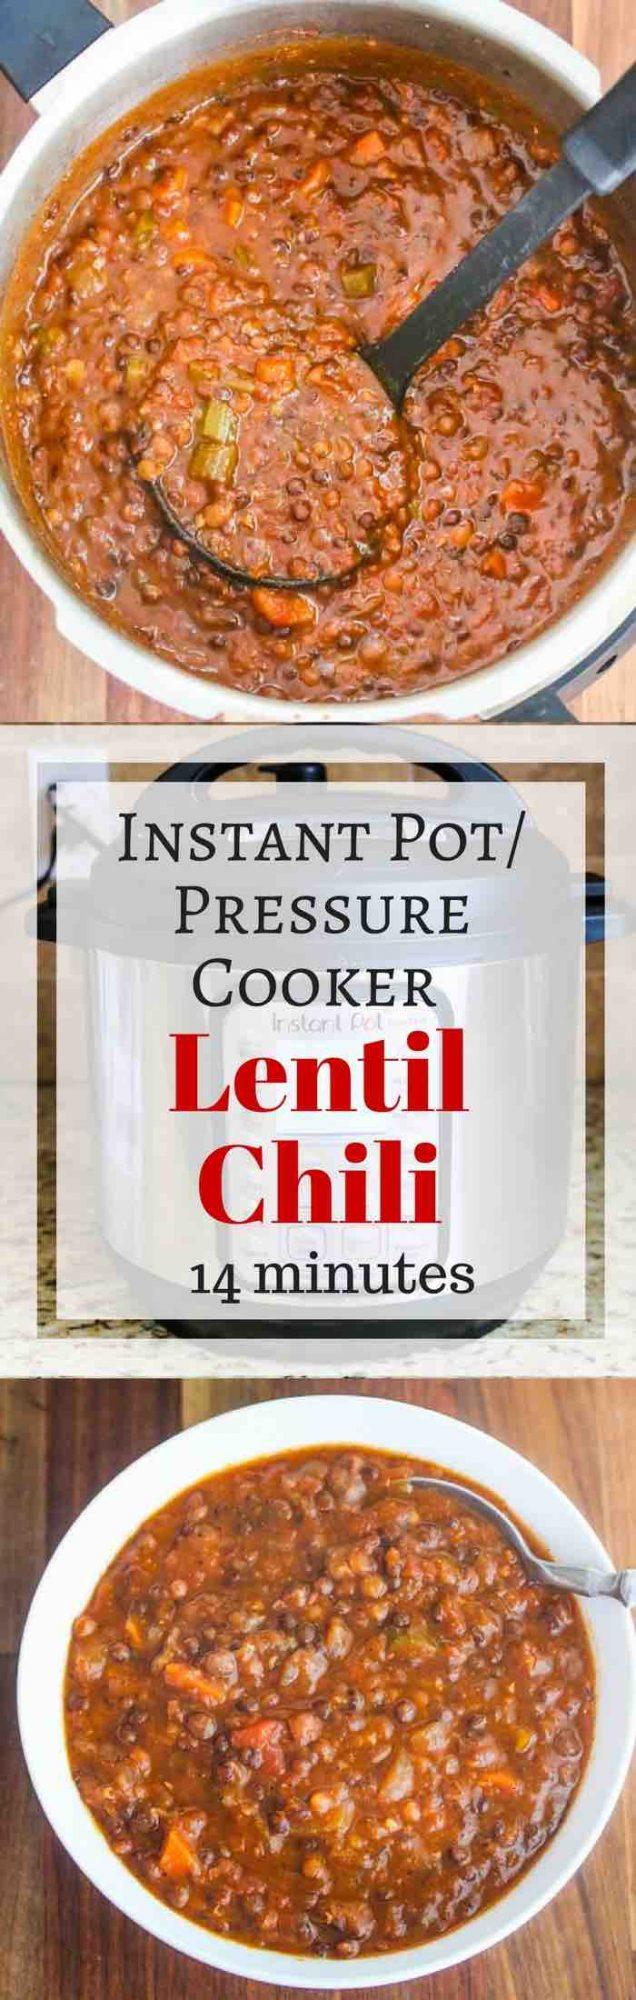 Pressure Cooker/Instant Pot Lentil Chili - vegan/vegetarian, quick, healthy, delicious meal